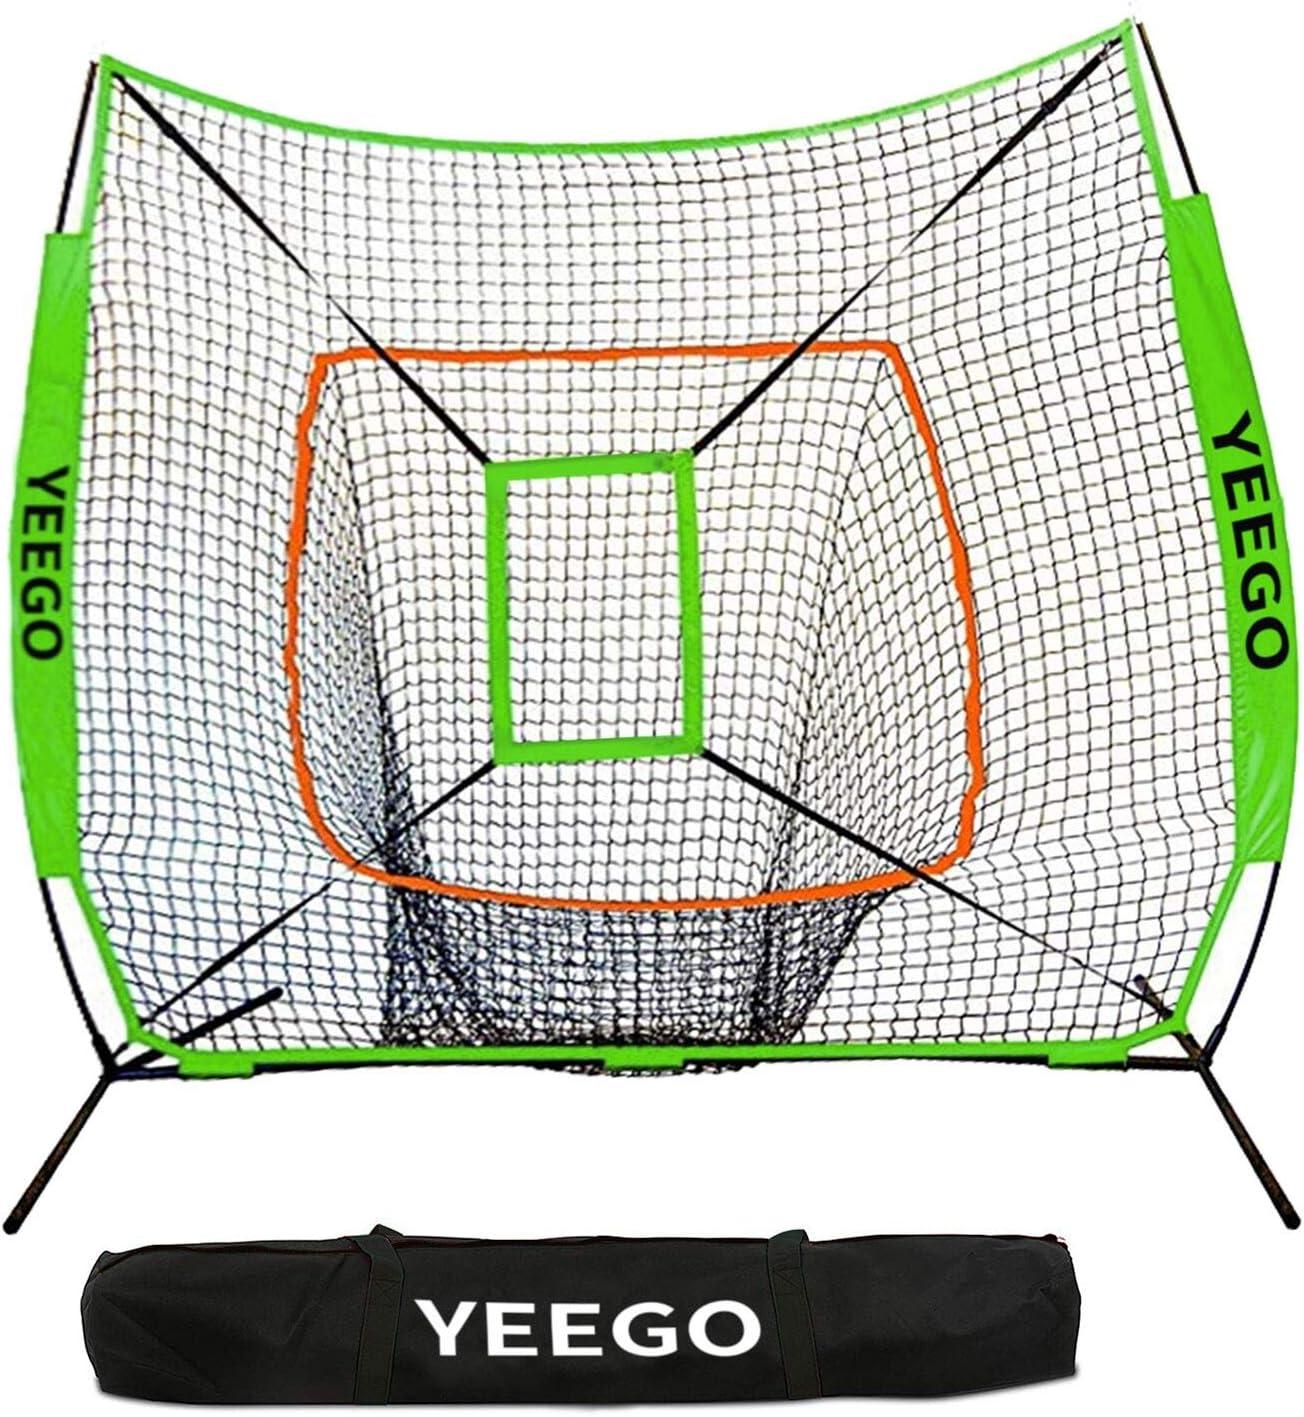 Baseball Softball Practice Net, YEEGO 7×7 Baseball Hitting Pitching Batting Cating Training Net with Carry Bag Bow Frame Bonus Strike Zone